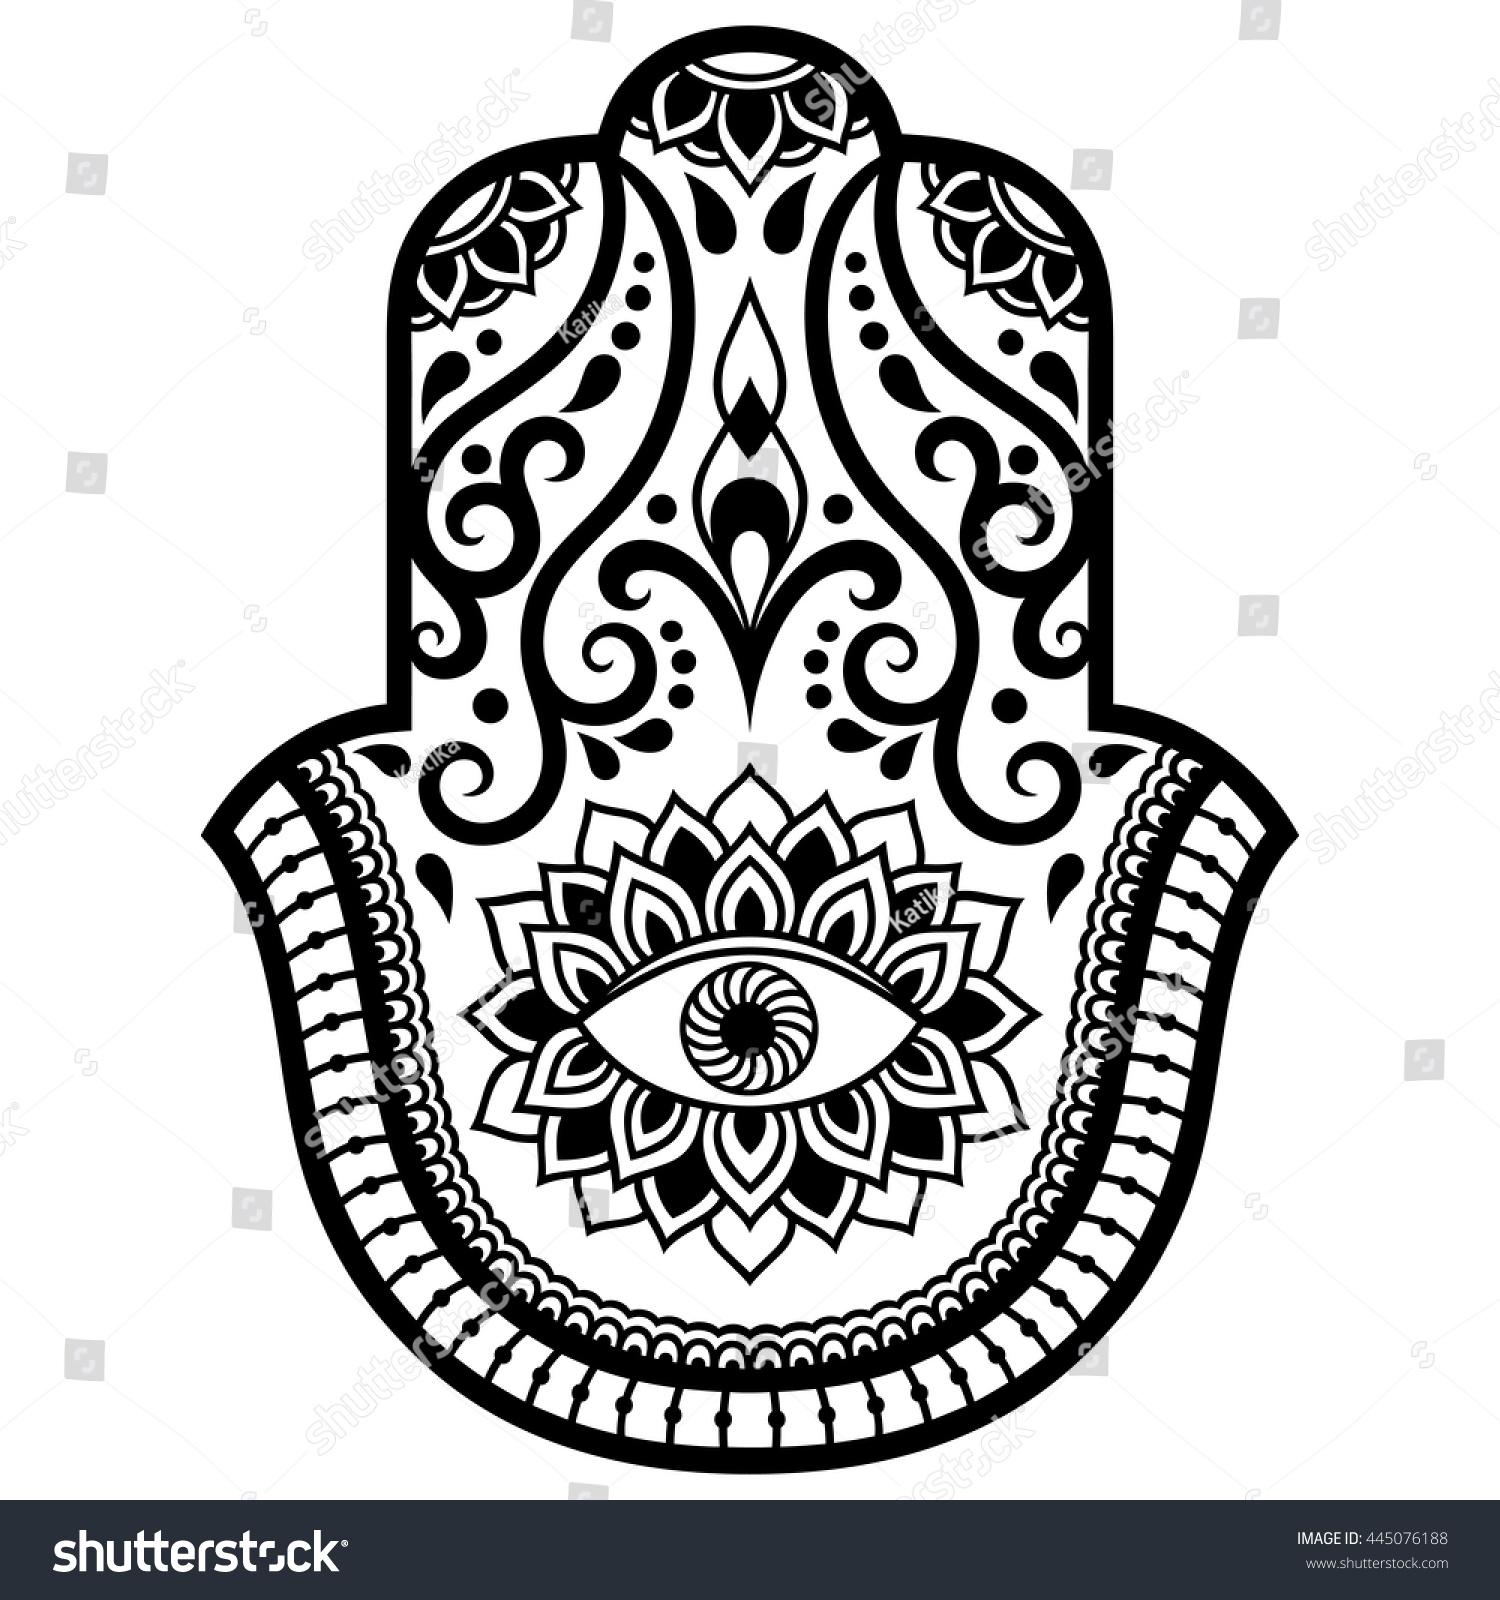 Elegant Hand Drawn Isolated Traditional Jewish Sacred Amulet And